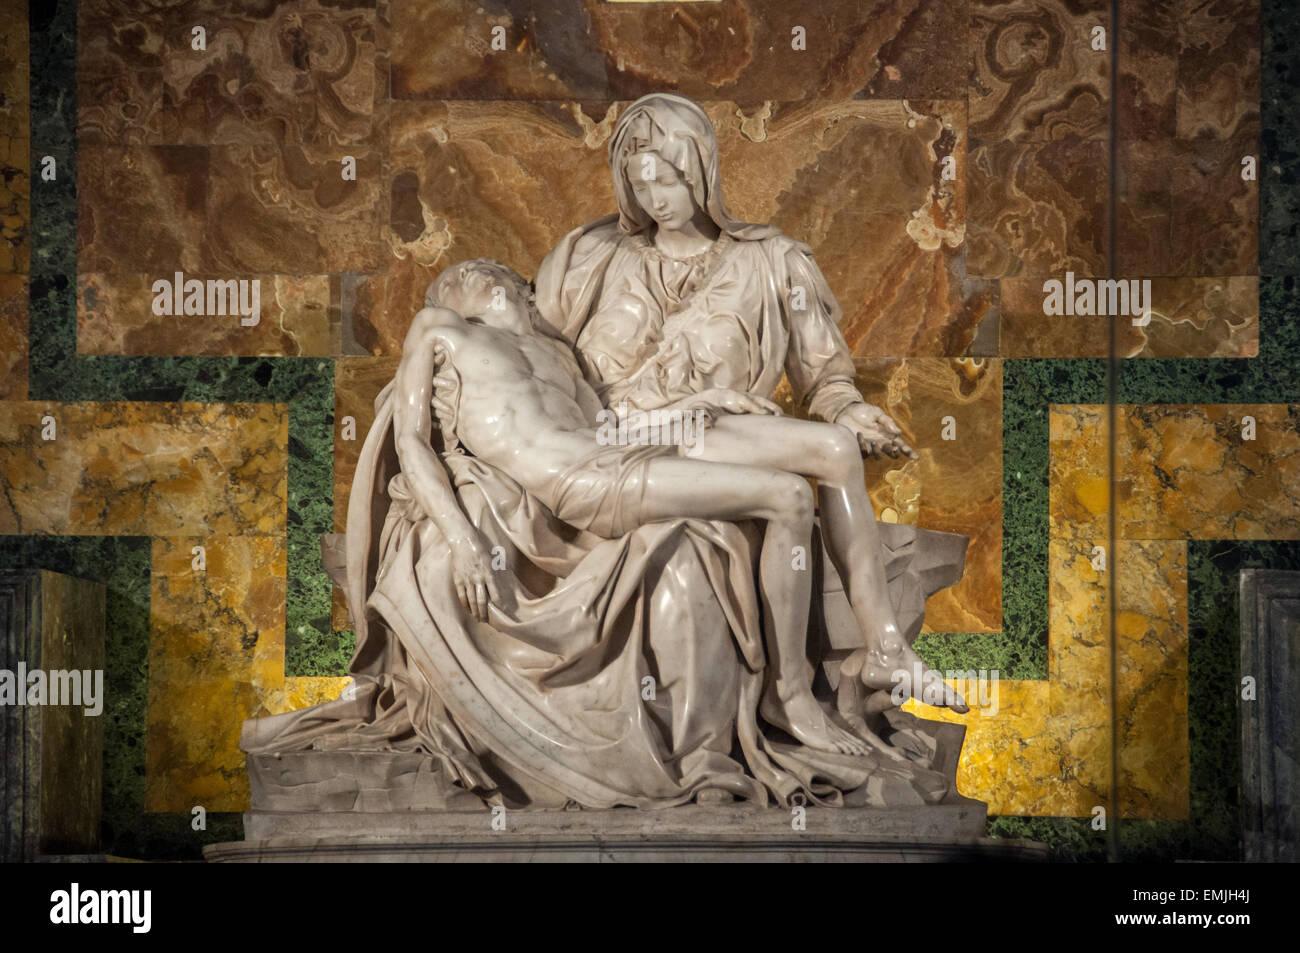 pieta-statue-of-the-virgin-mary-cradling